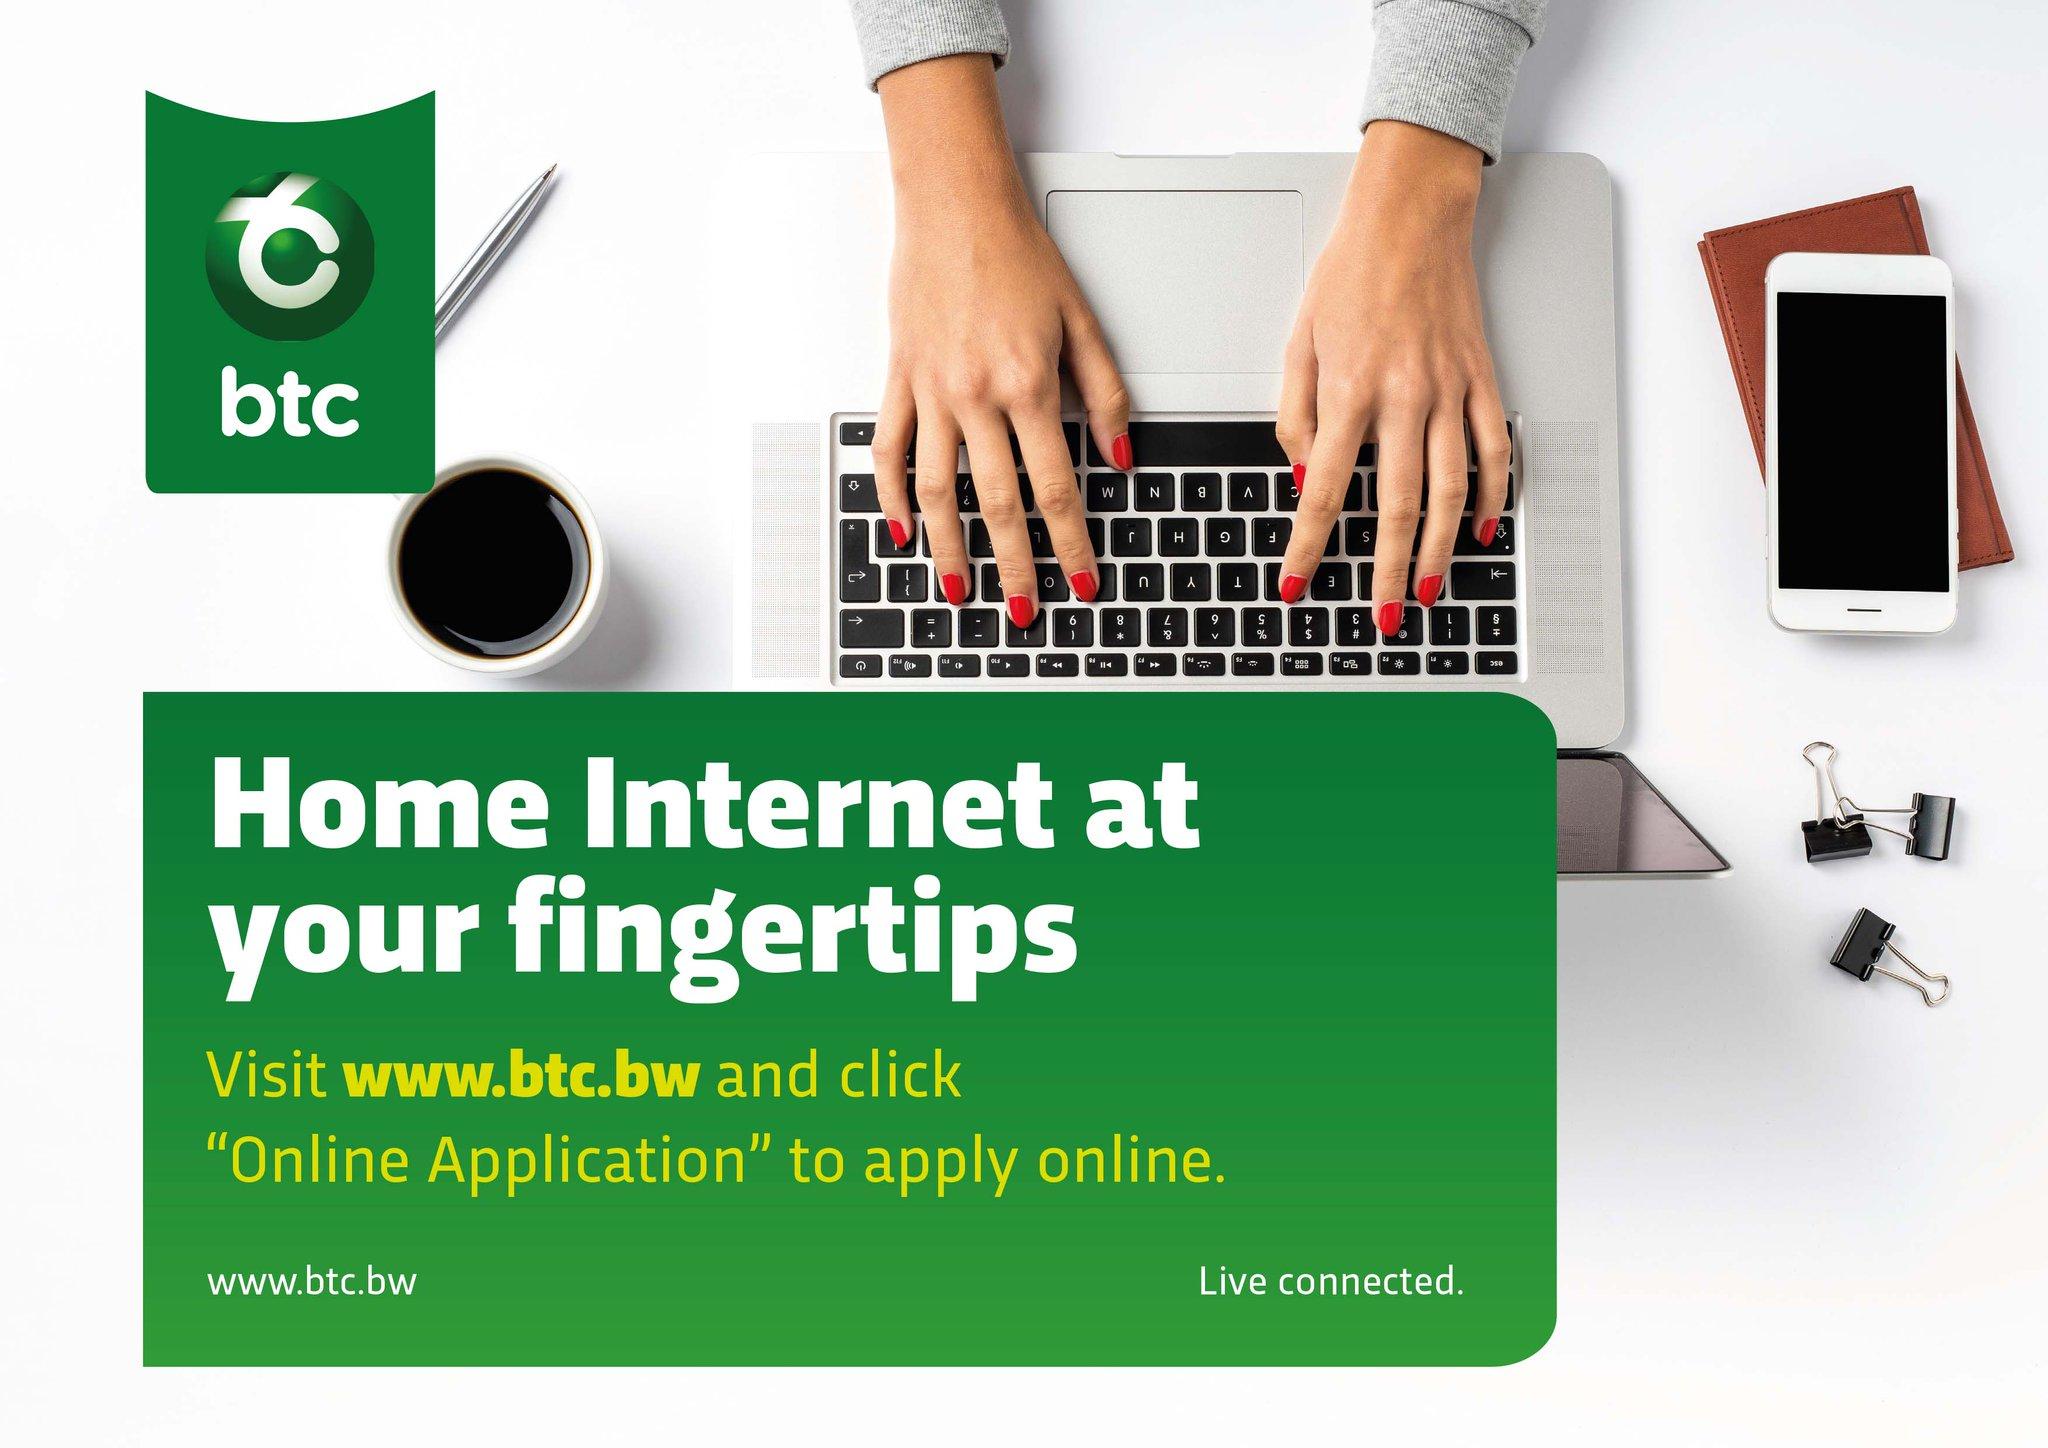 btc botswana internet)